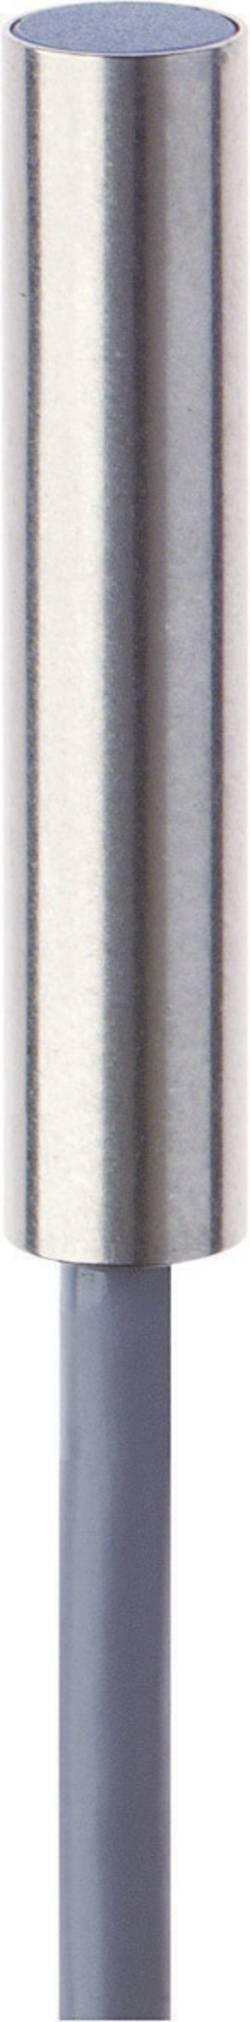 Indukční senzor PNP Contrinex DW-AD-623-065 (220 220 053), 2 mm, IP67